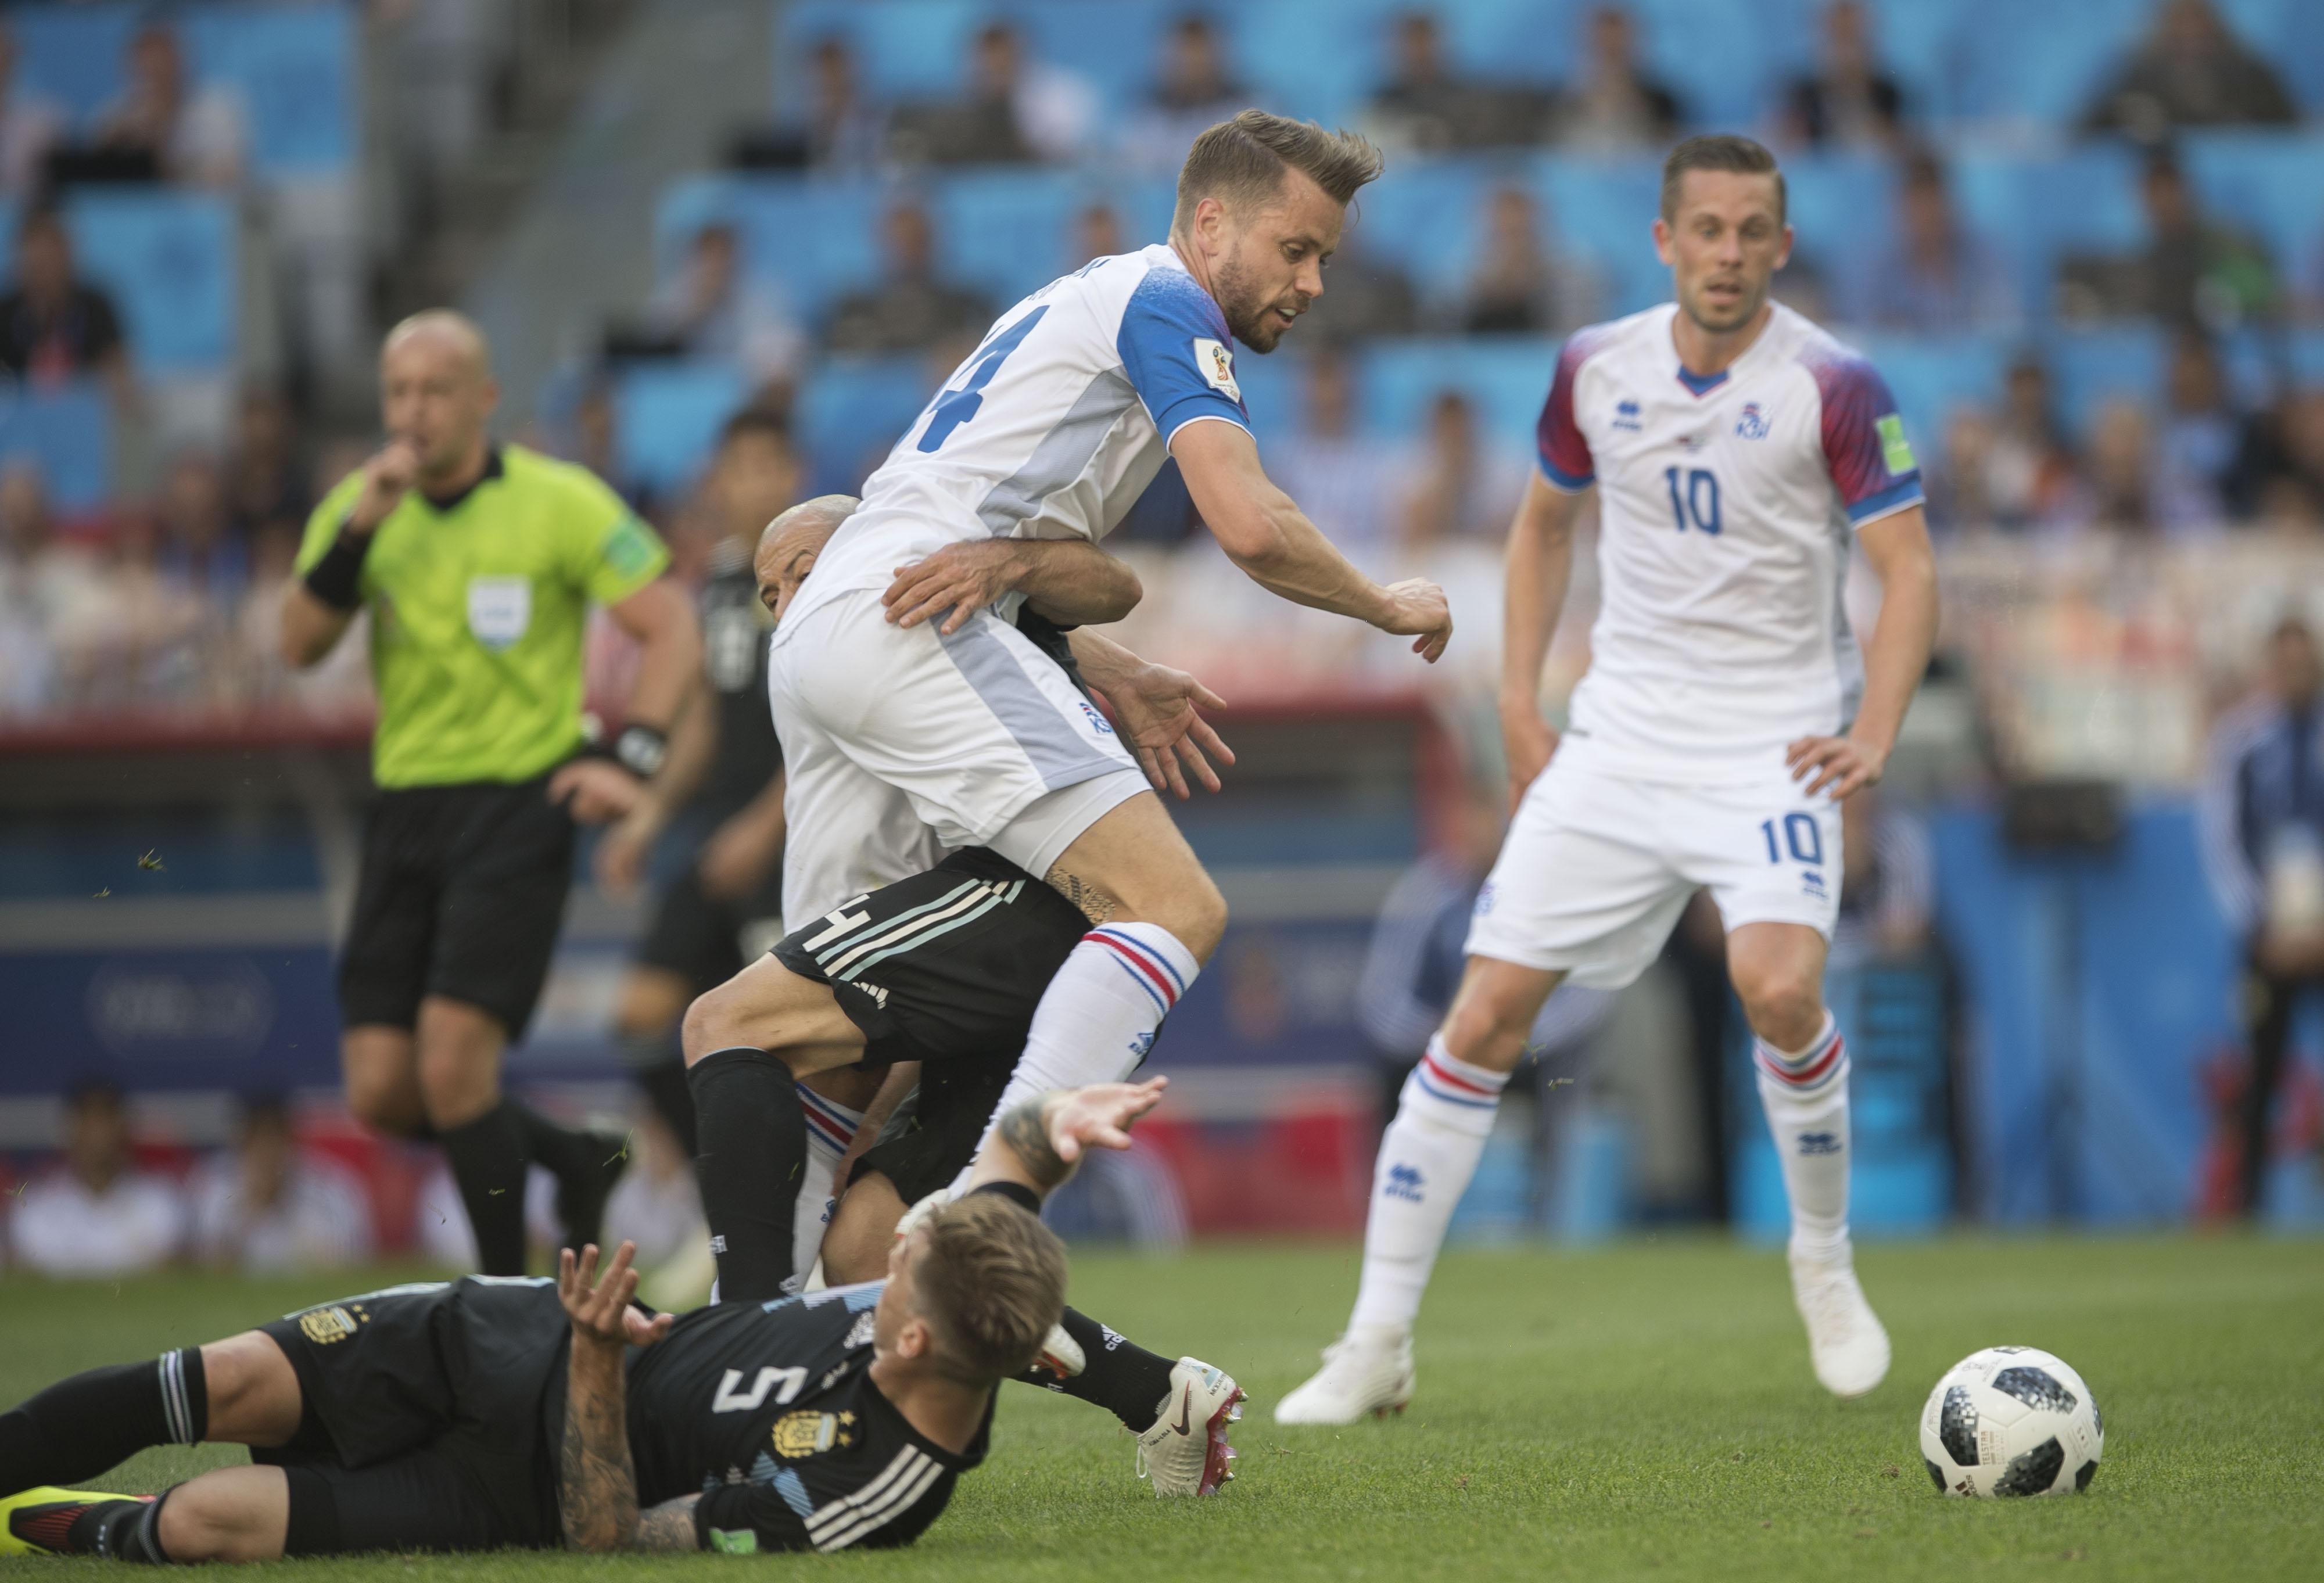 ¡Islandia empata a Argentina! Messi falla un penal